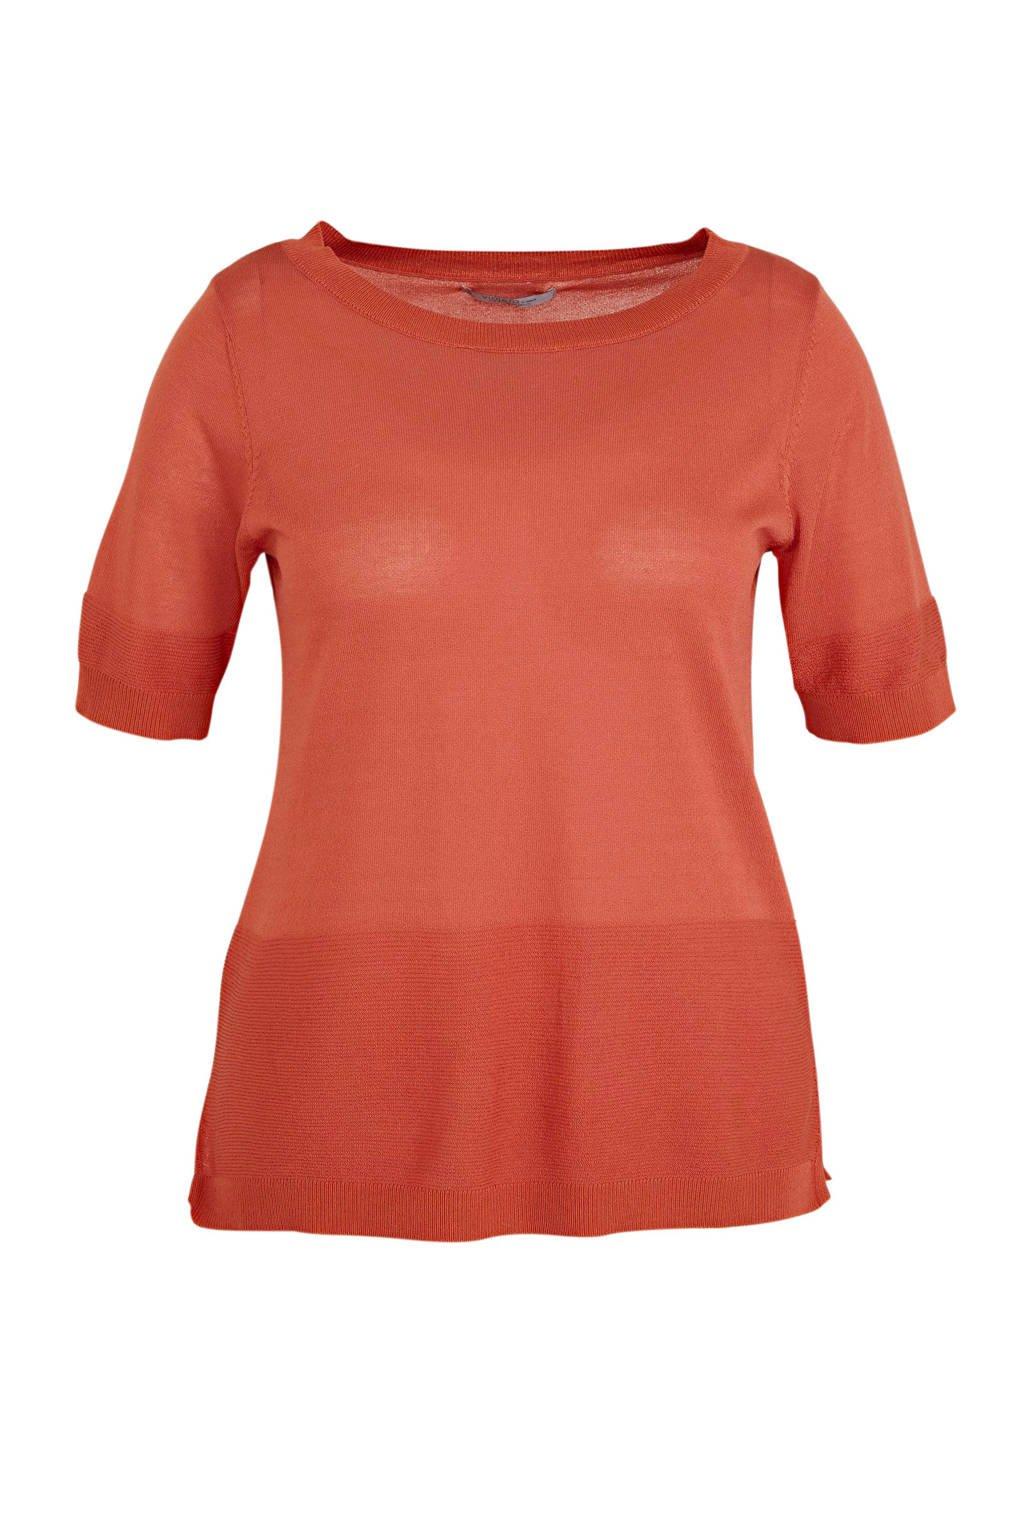 Violeta by Mango fijngebreide trui met textuur oranje, Oranje